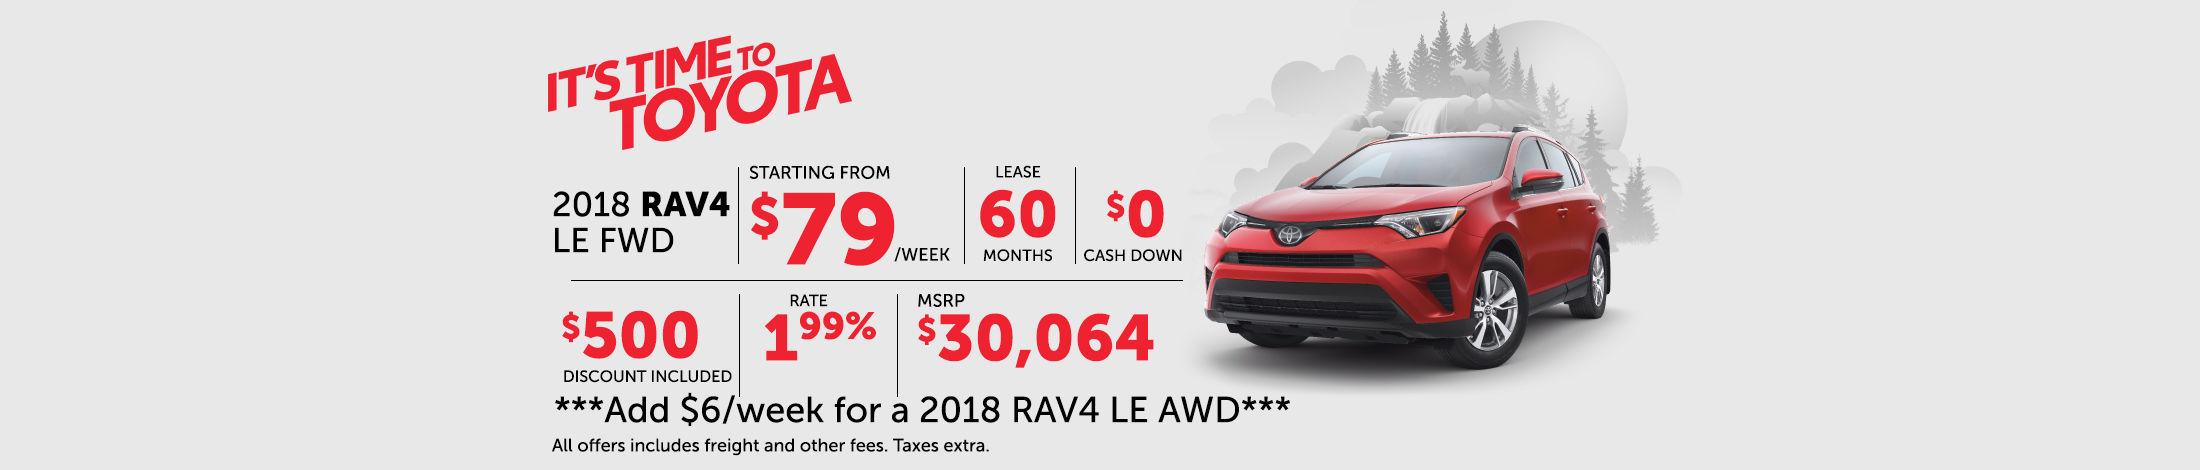 2018 Rav4 LE FWD